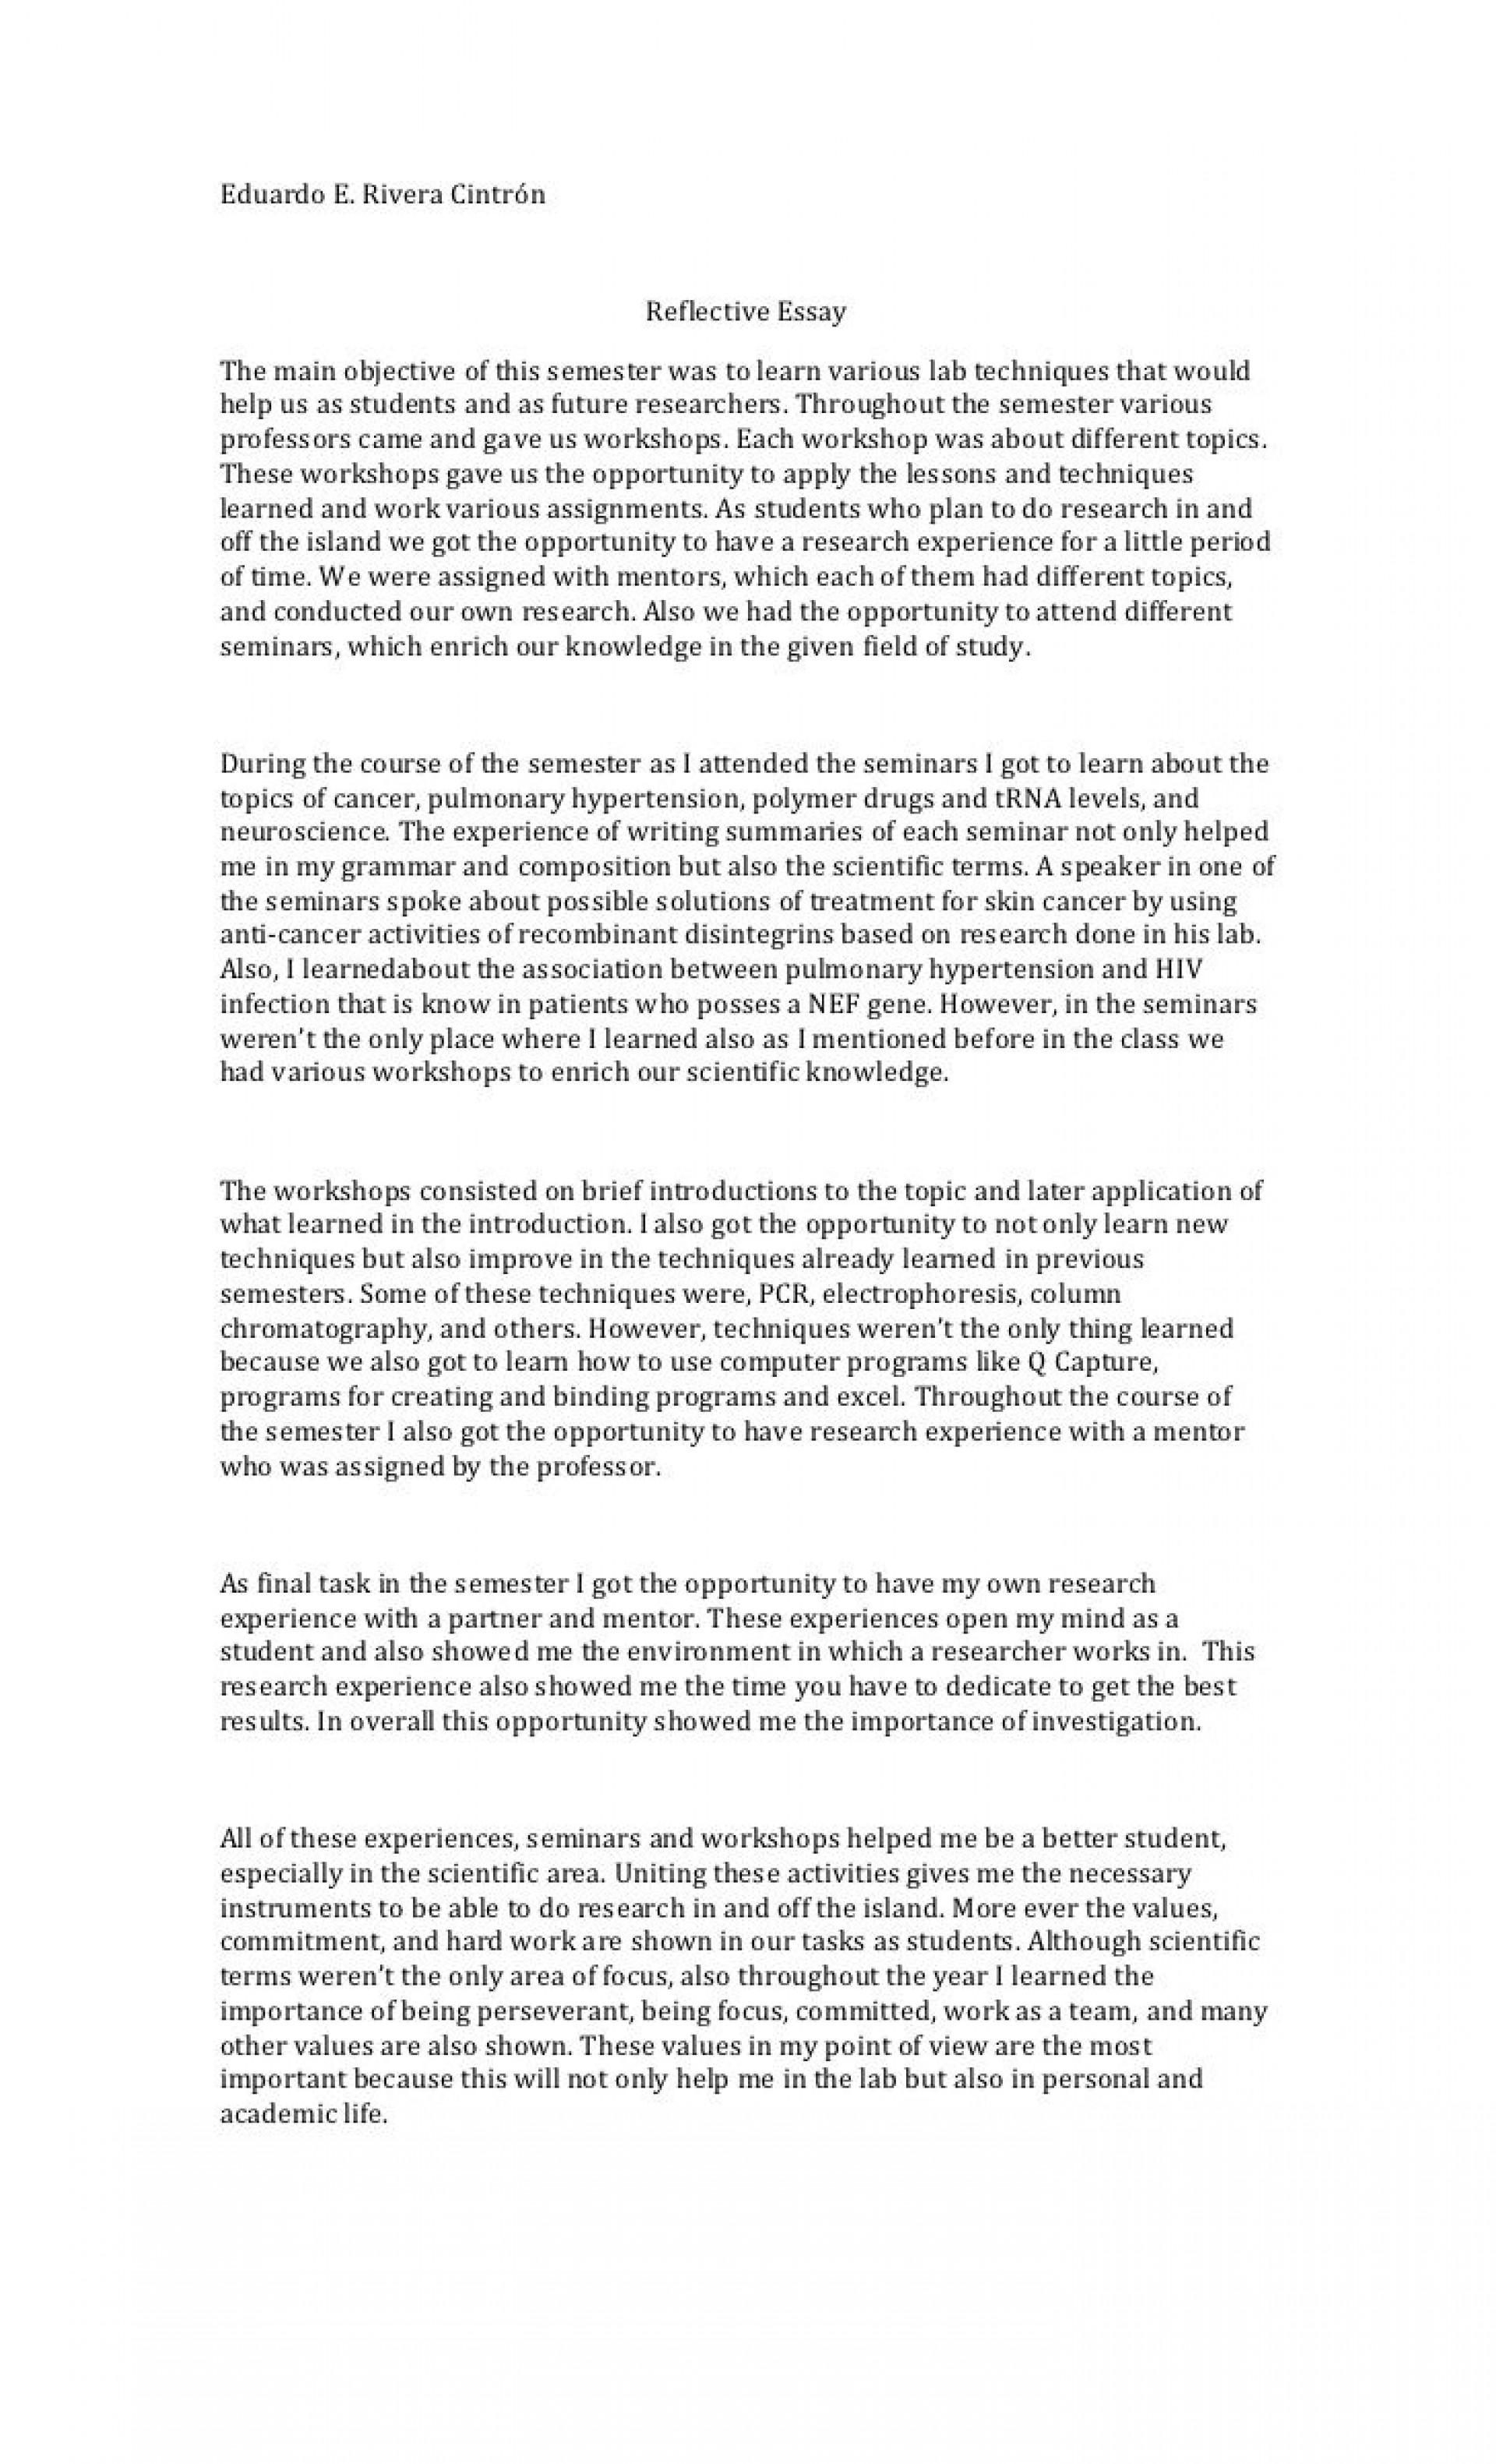 Pope urban ii speech essay